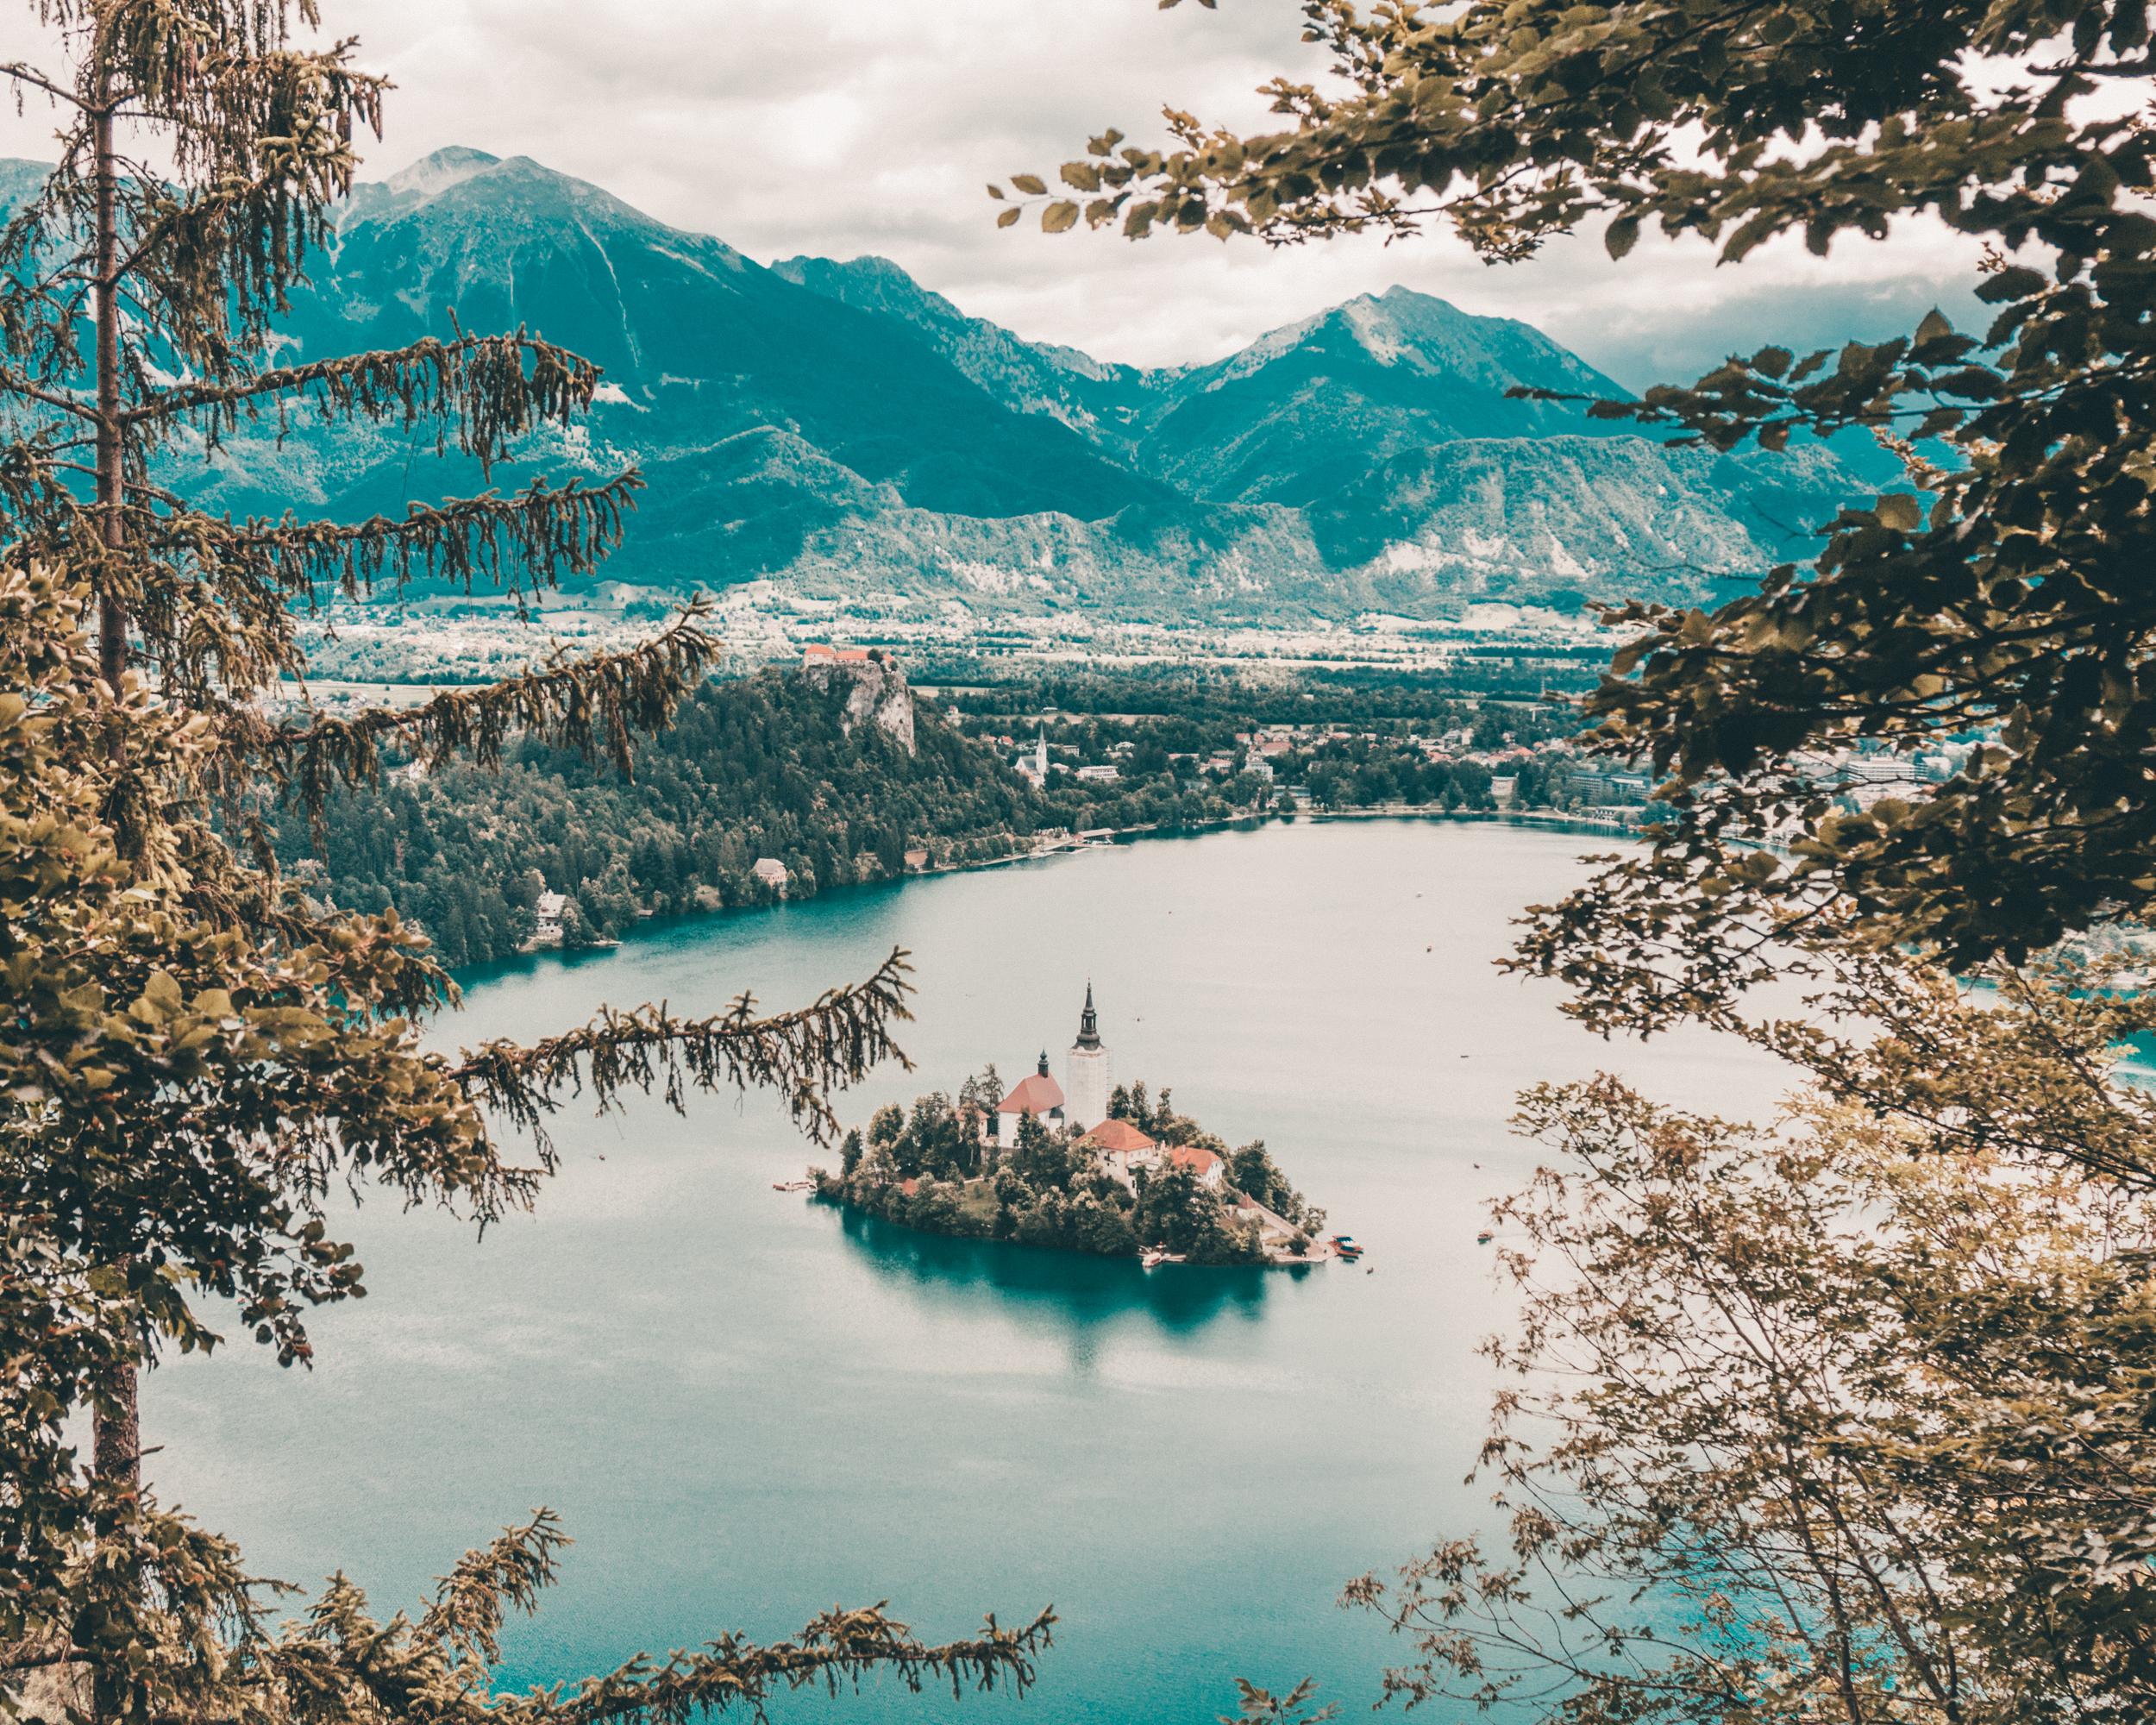 lake bled photography beautiful fairytale best places travel couple explore world nature